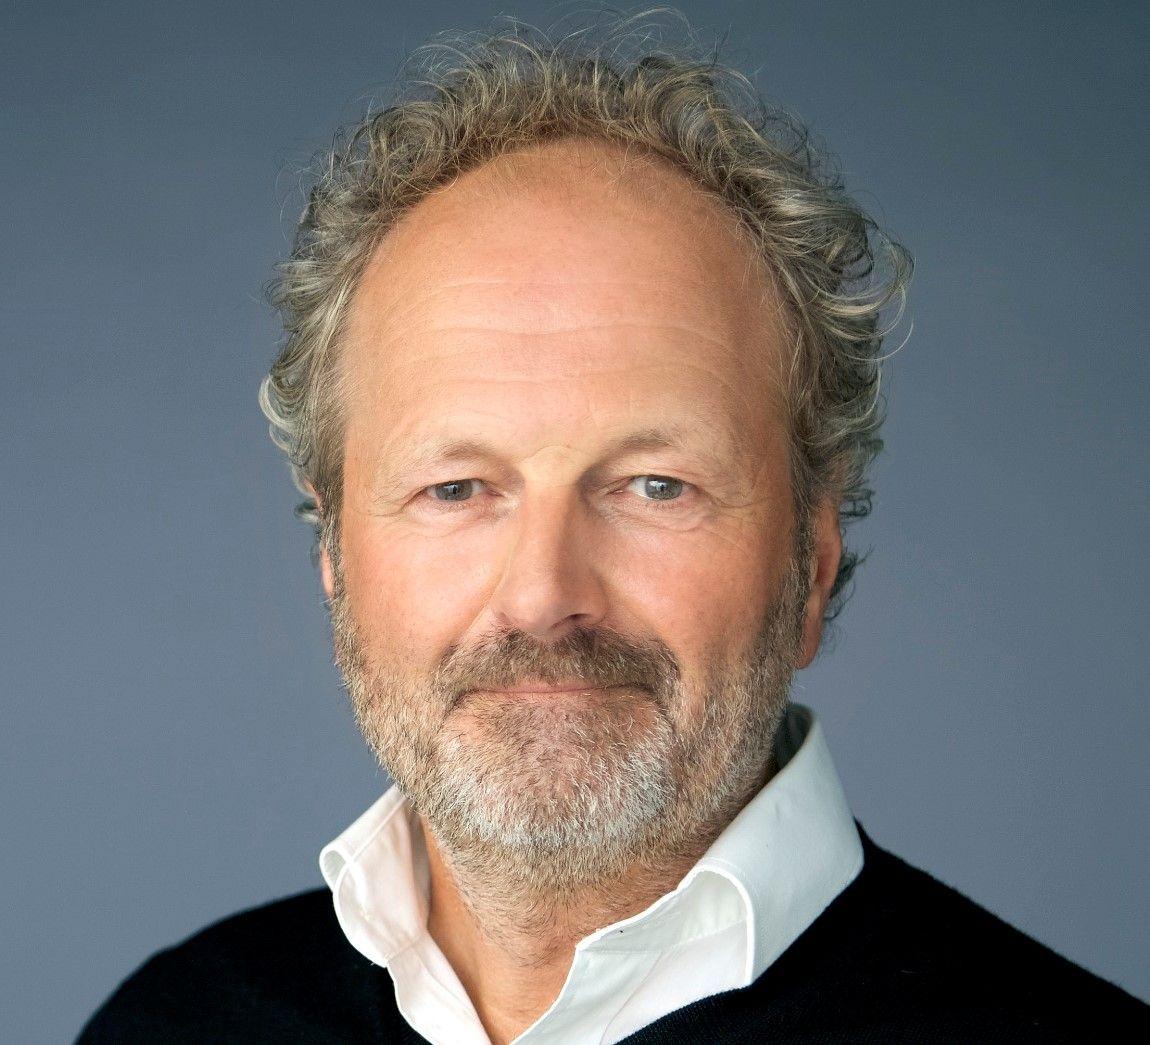 Jan Erik Grindheim